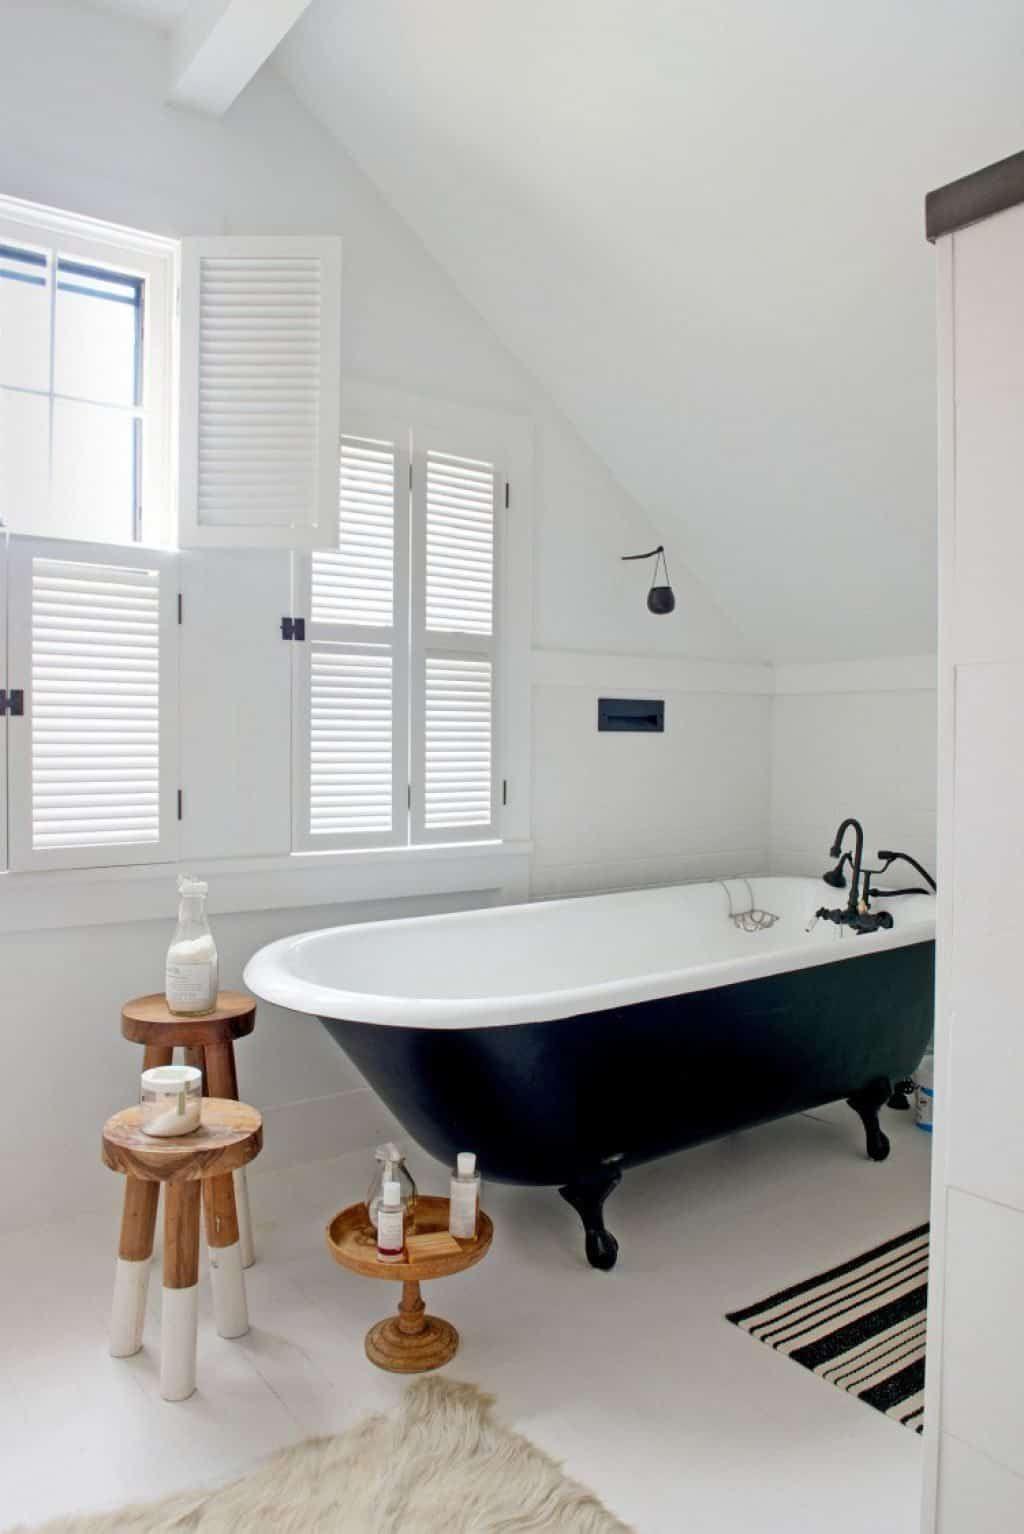 Bathroom Clawfoot Tubs Lend An Antique Appearance Black Clawfoot